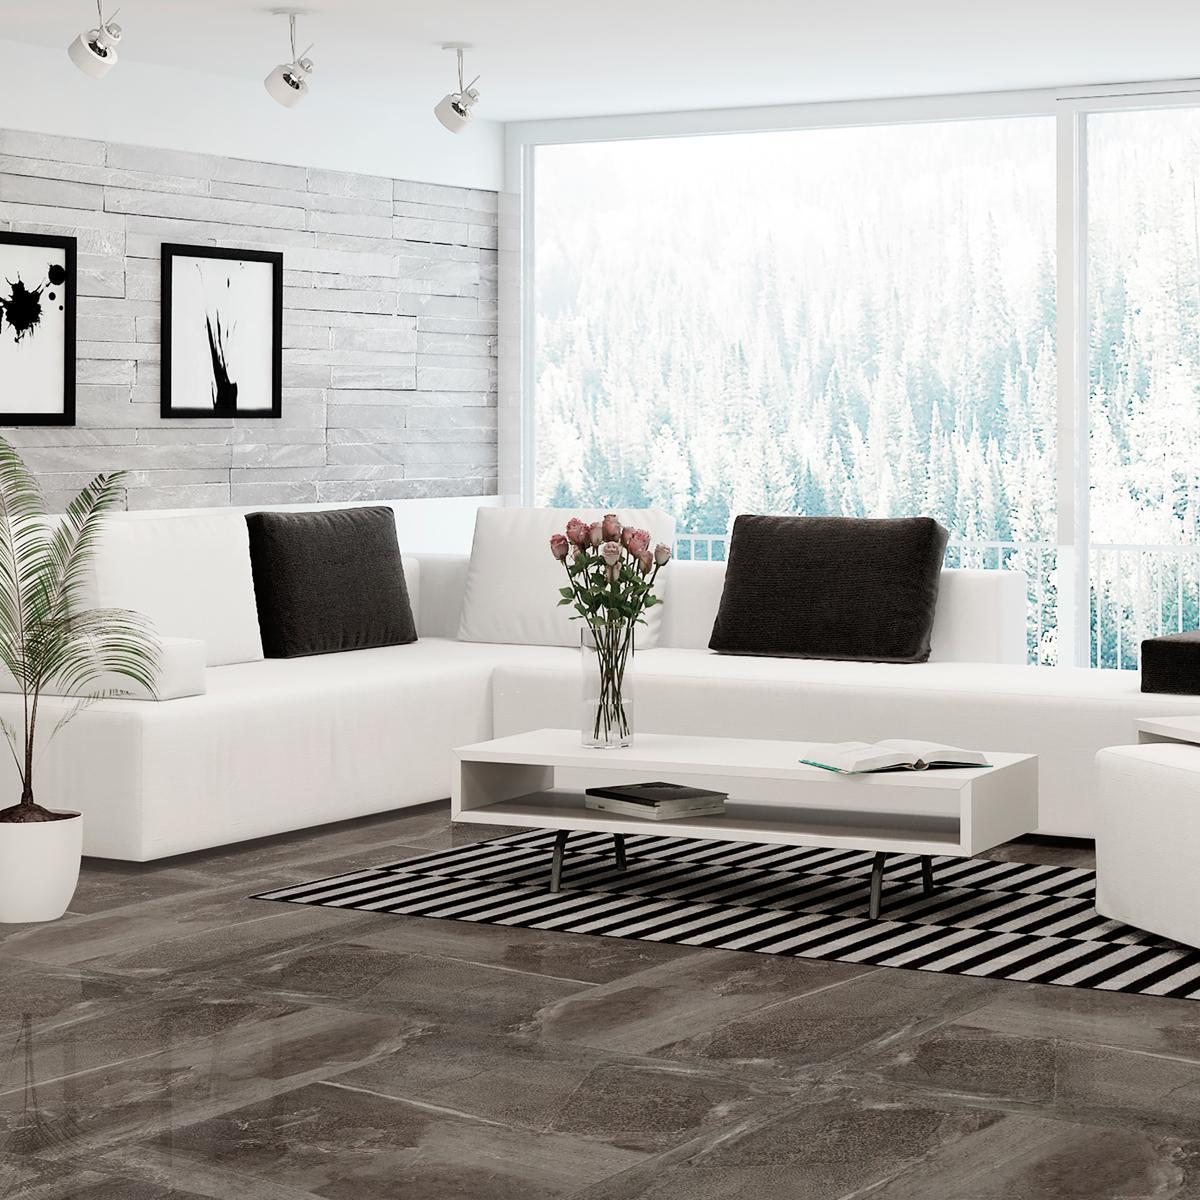 Porcelanato Eufrates Gris Oscuro Brillante - 60X60 cm - 1.44 m2